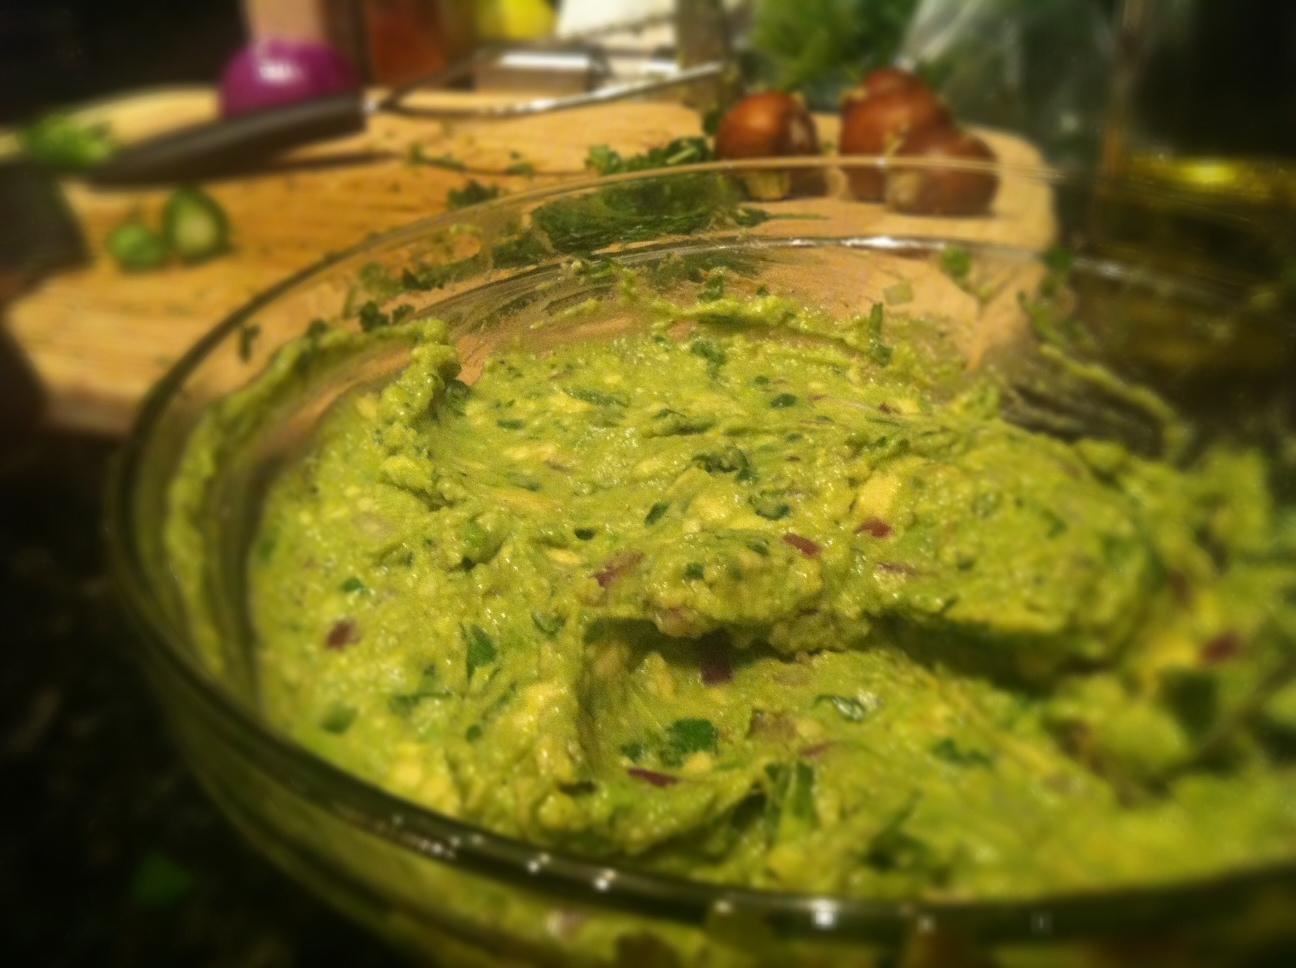 ... guacamole guacamole guacamole guacamole fried guacamole perfect